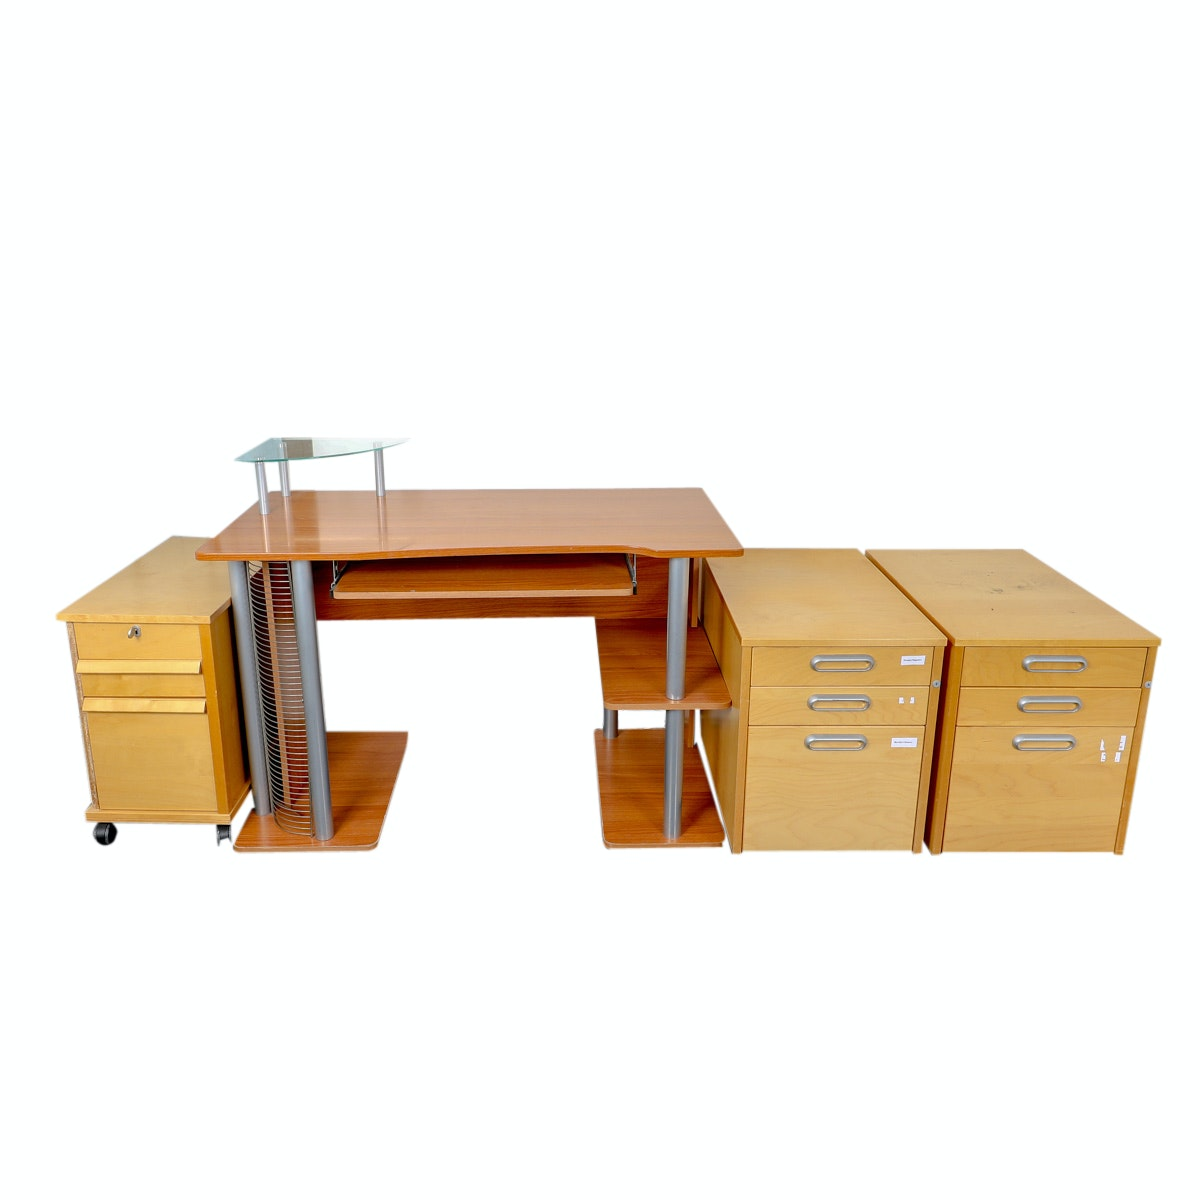 Contemporary Computer Desk and File Cabinets